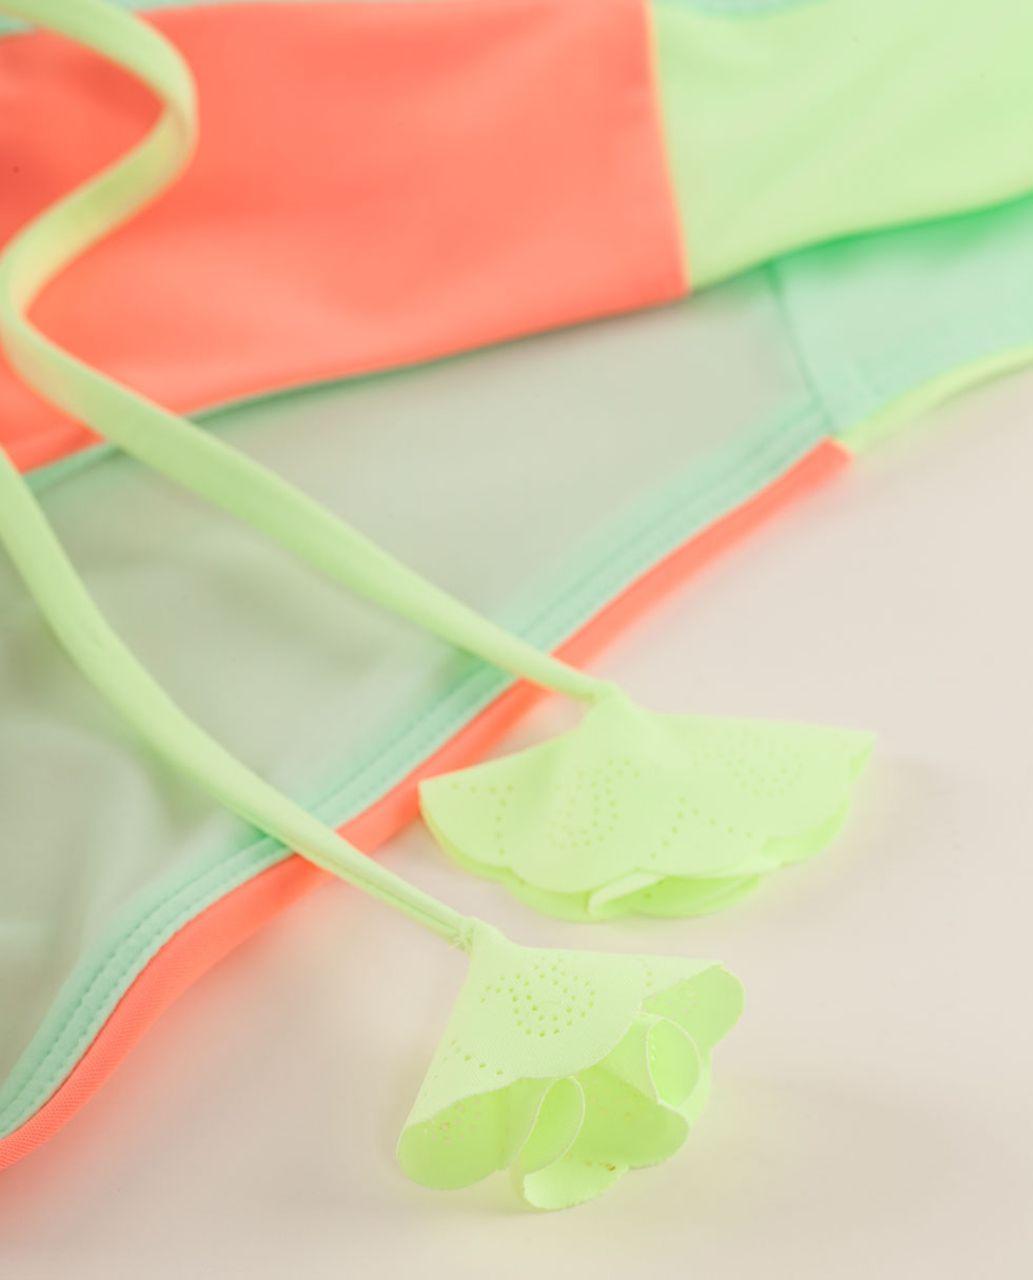 Lululemon Sandy Savasana Bottom - Fresh Teal / Pop Orange / Faded Zap